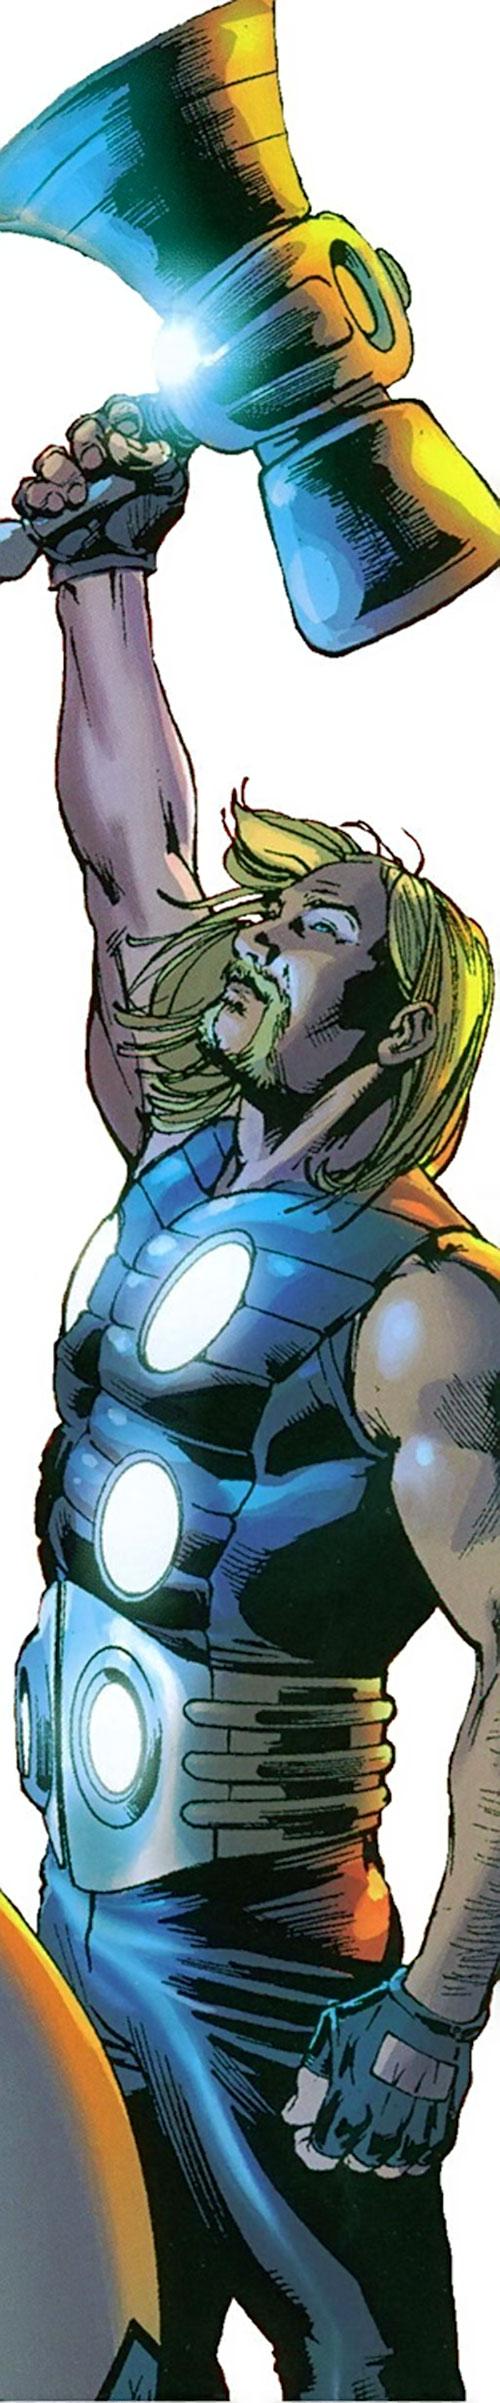 Ultimate Thor (Marvel Comics)